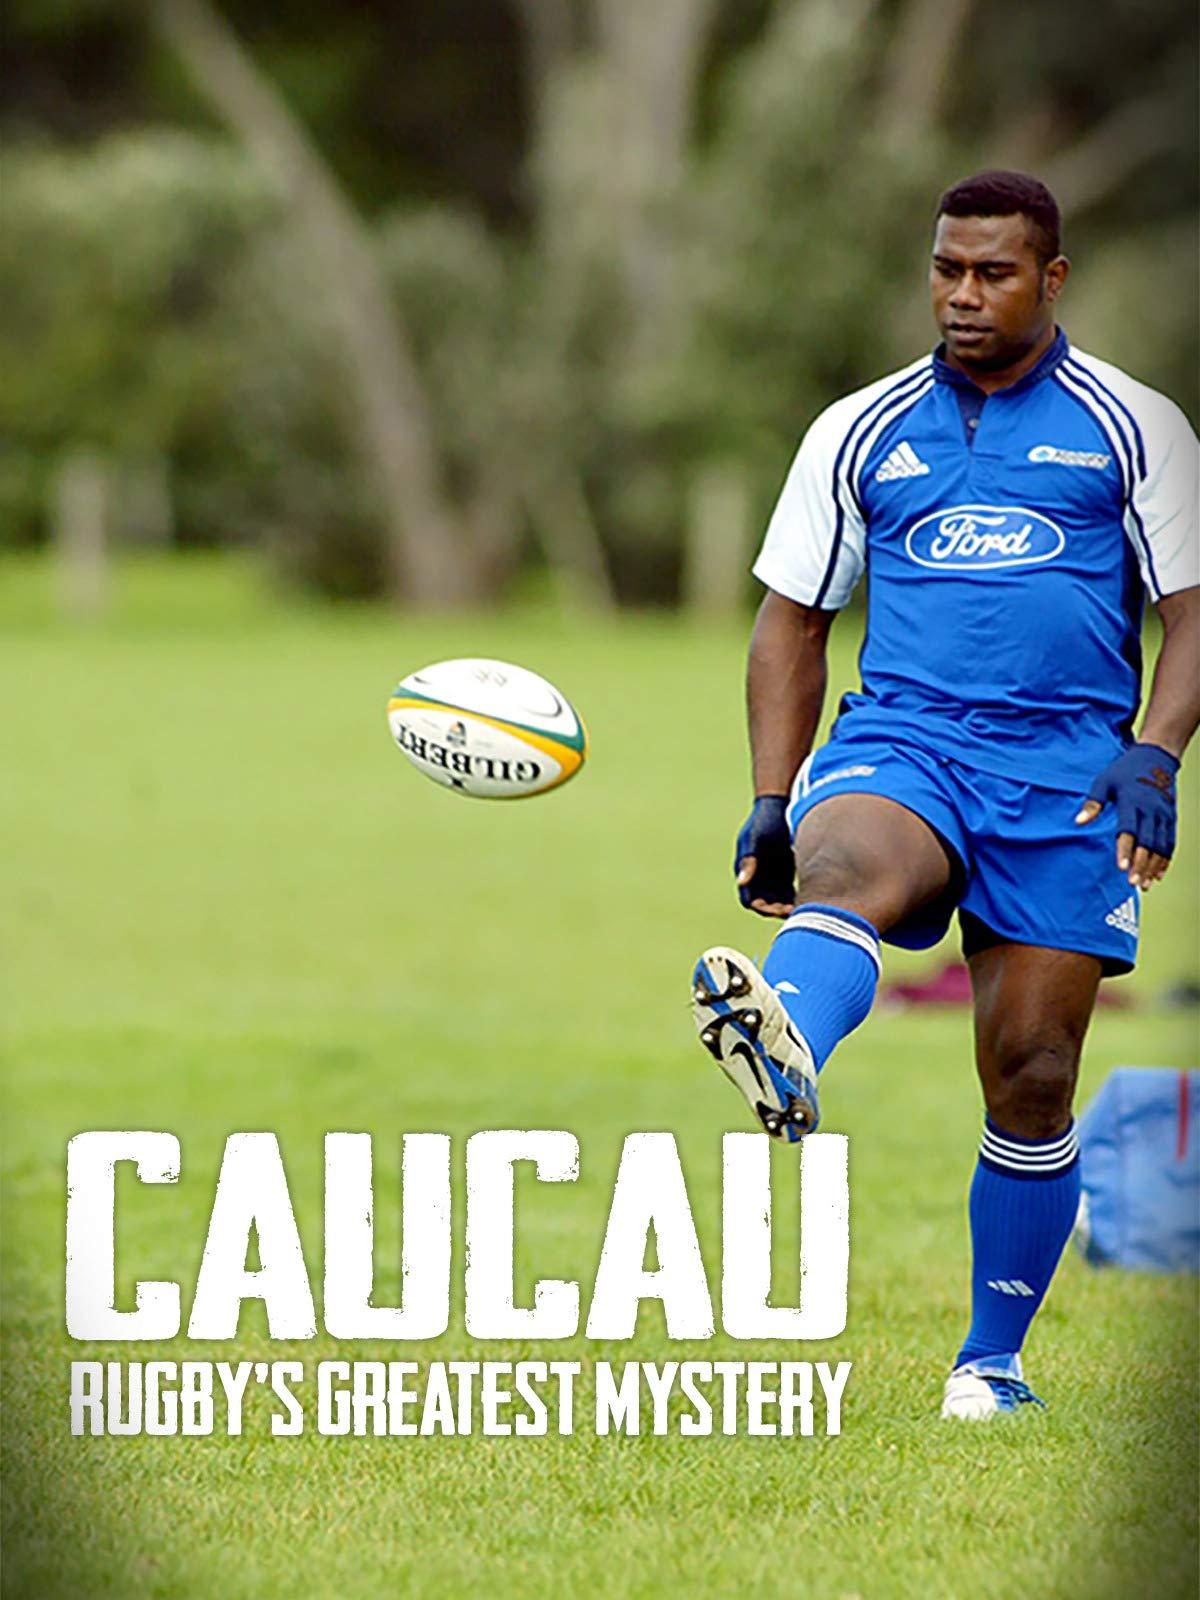 Caucau: Rugby's Greatest Mystery